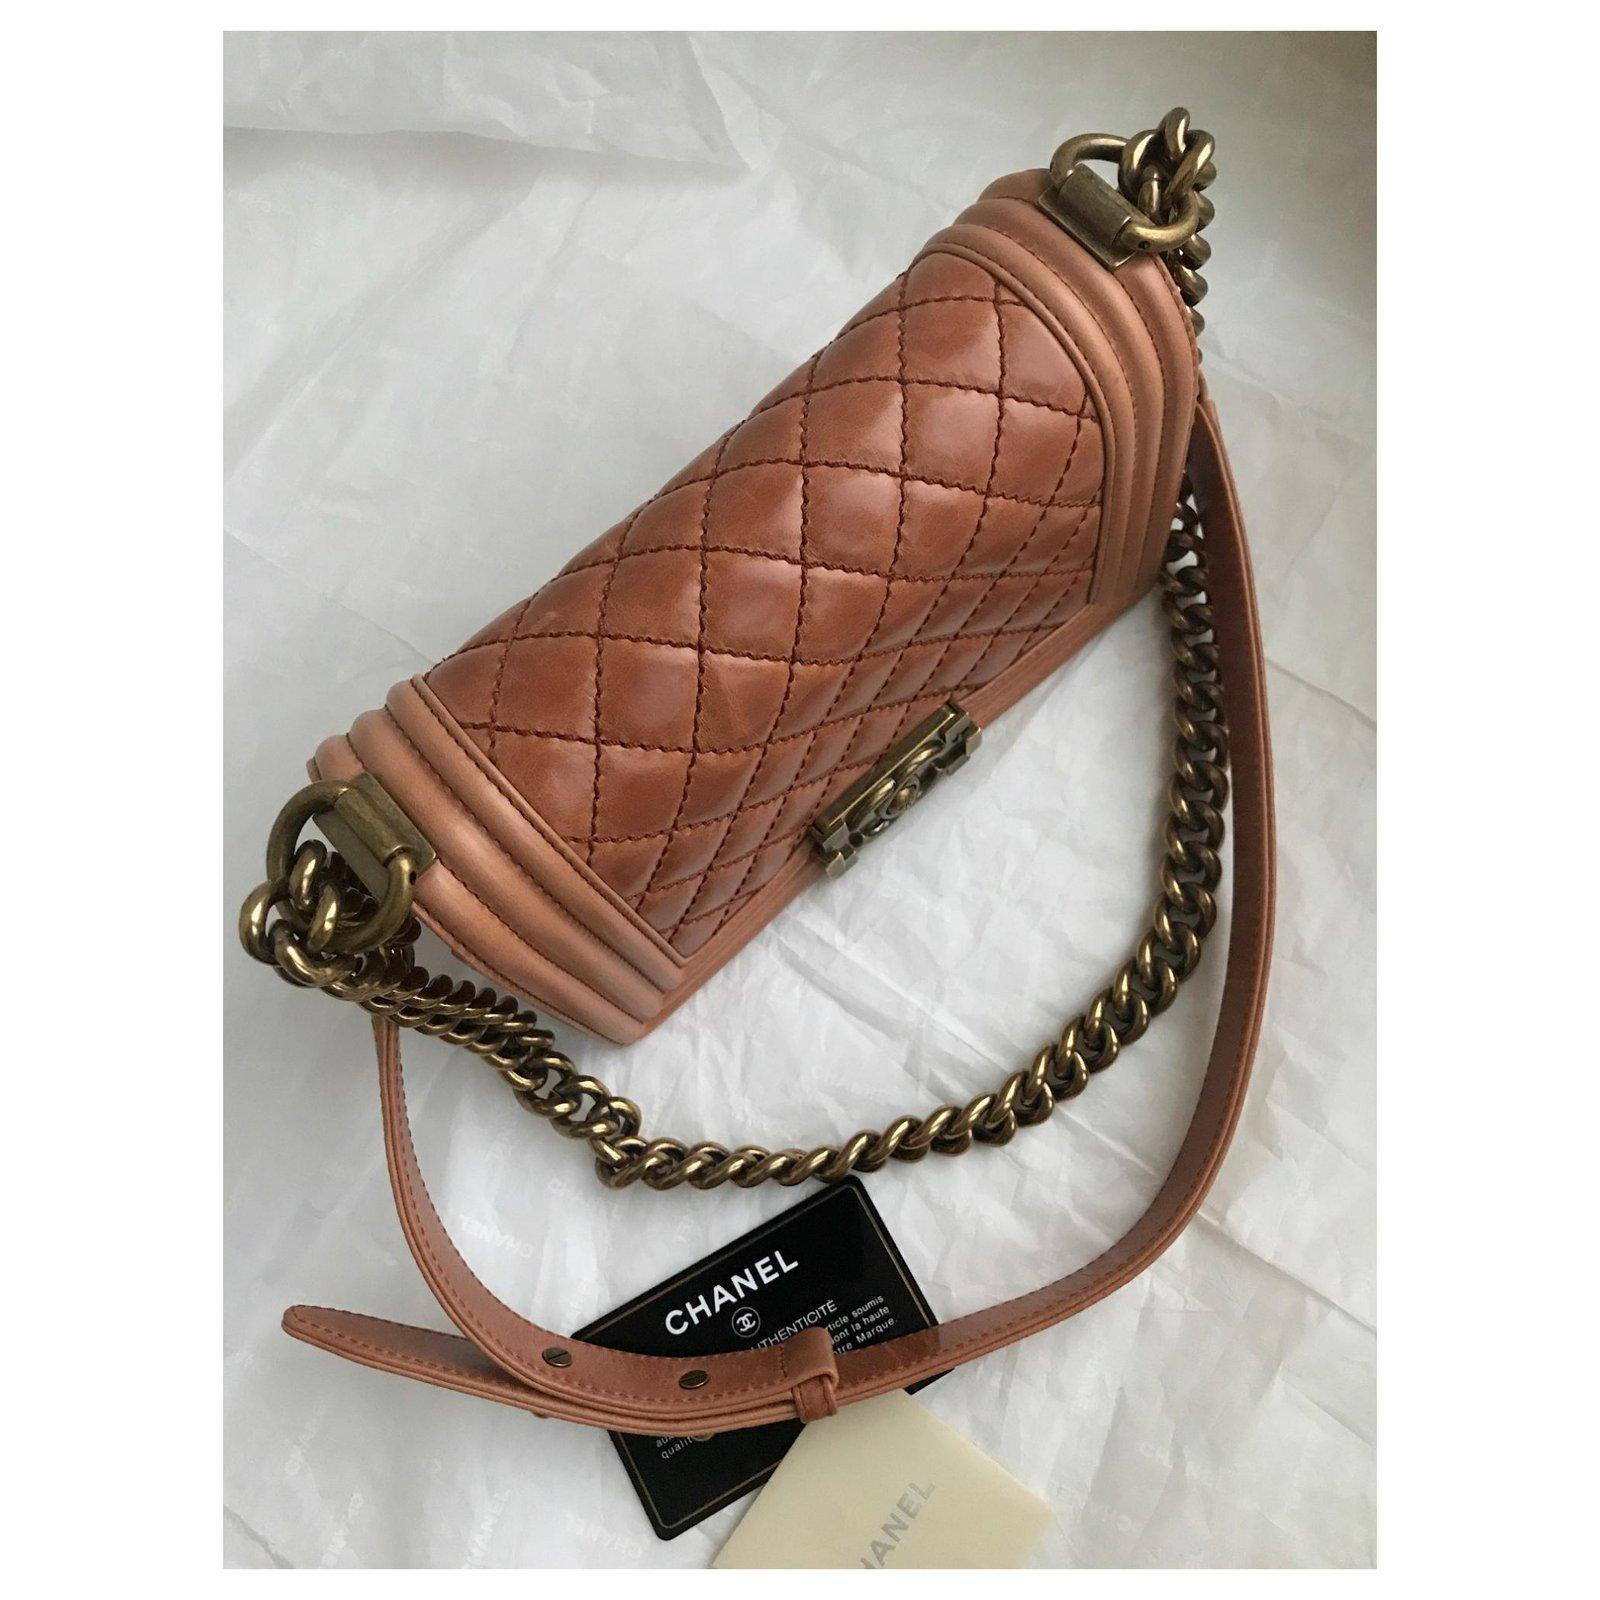 2f3f462b4d96 Chanel Never worn w/card Small Boy Flap Bag Handbags Leather Other  ref.120858 - Joli Closet